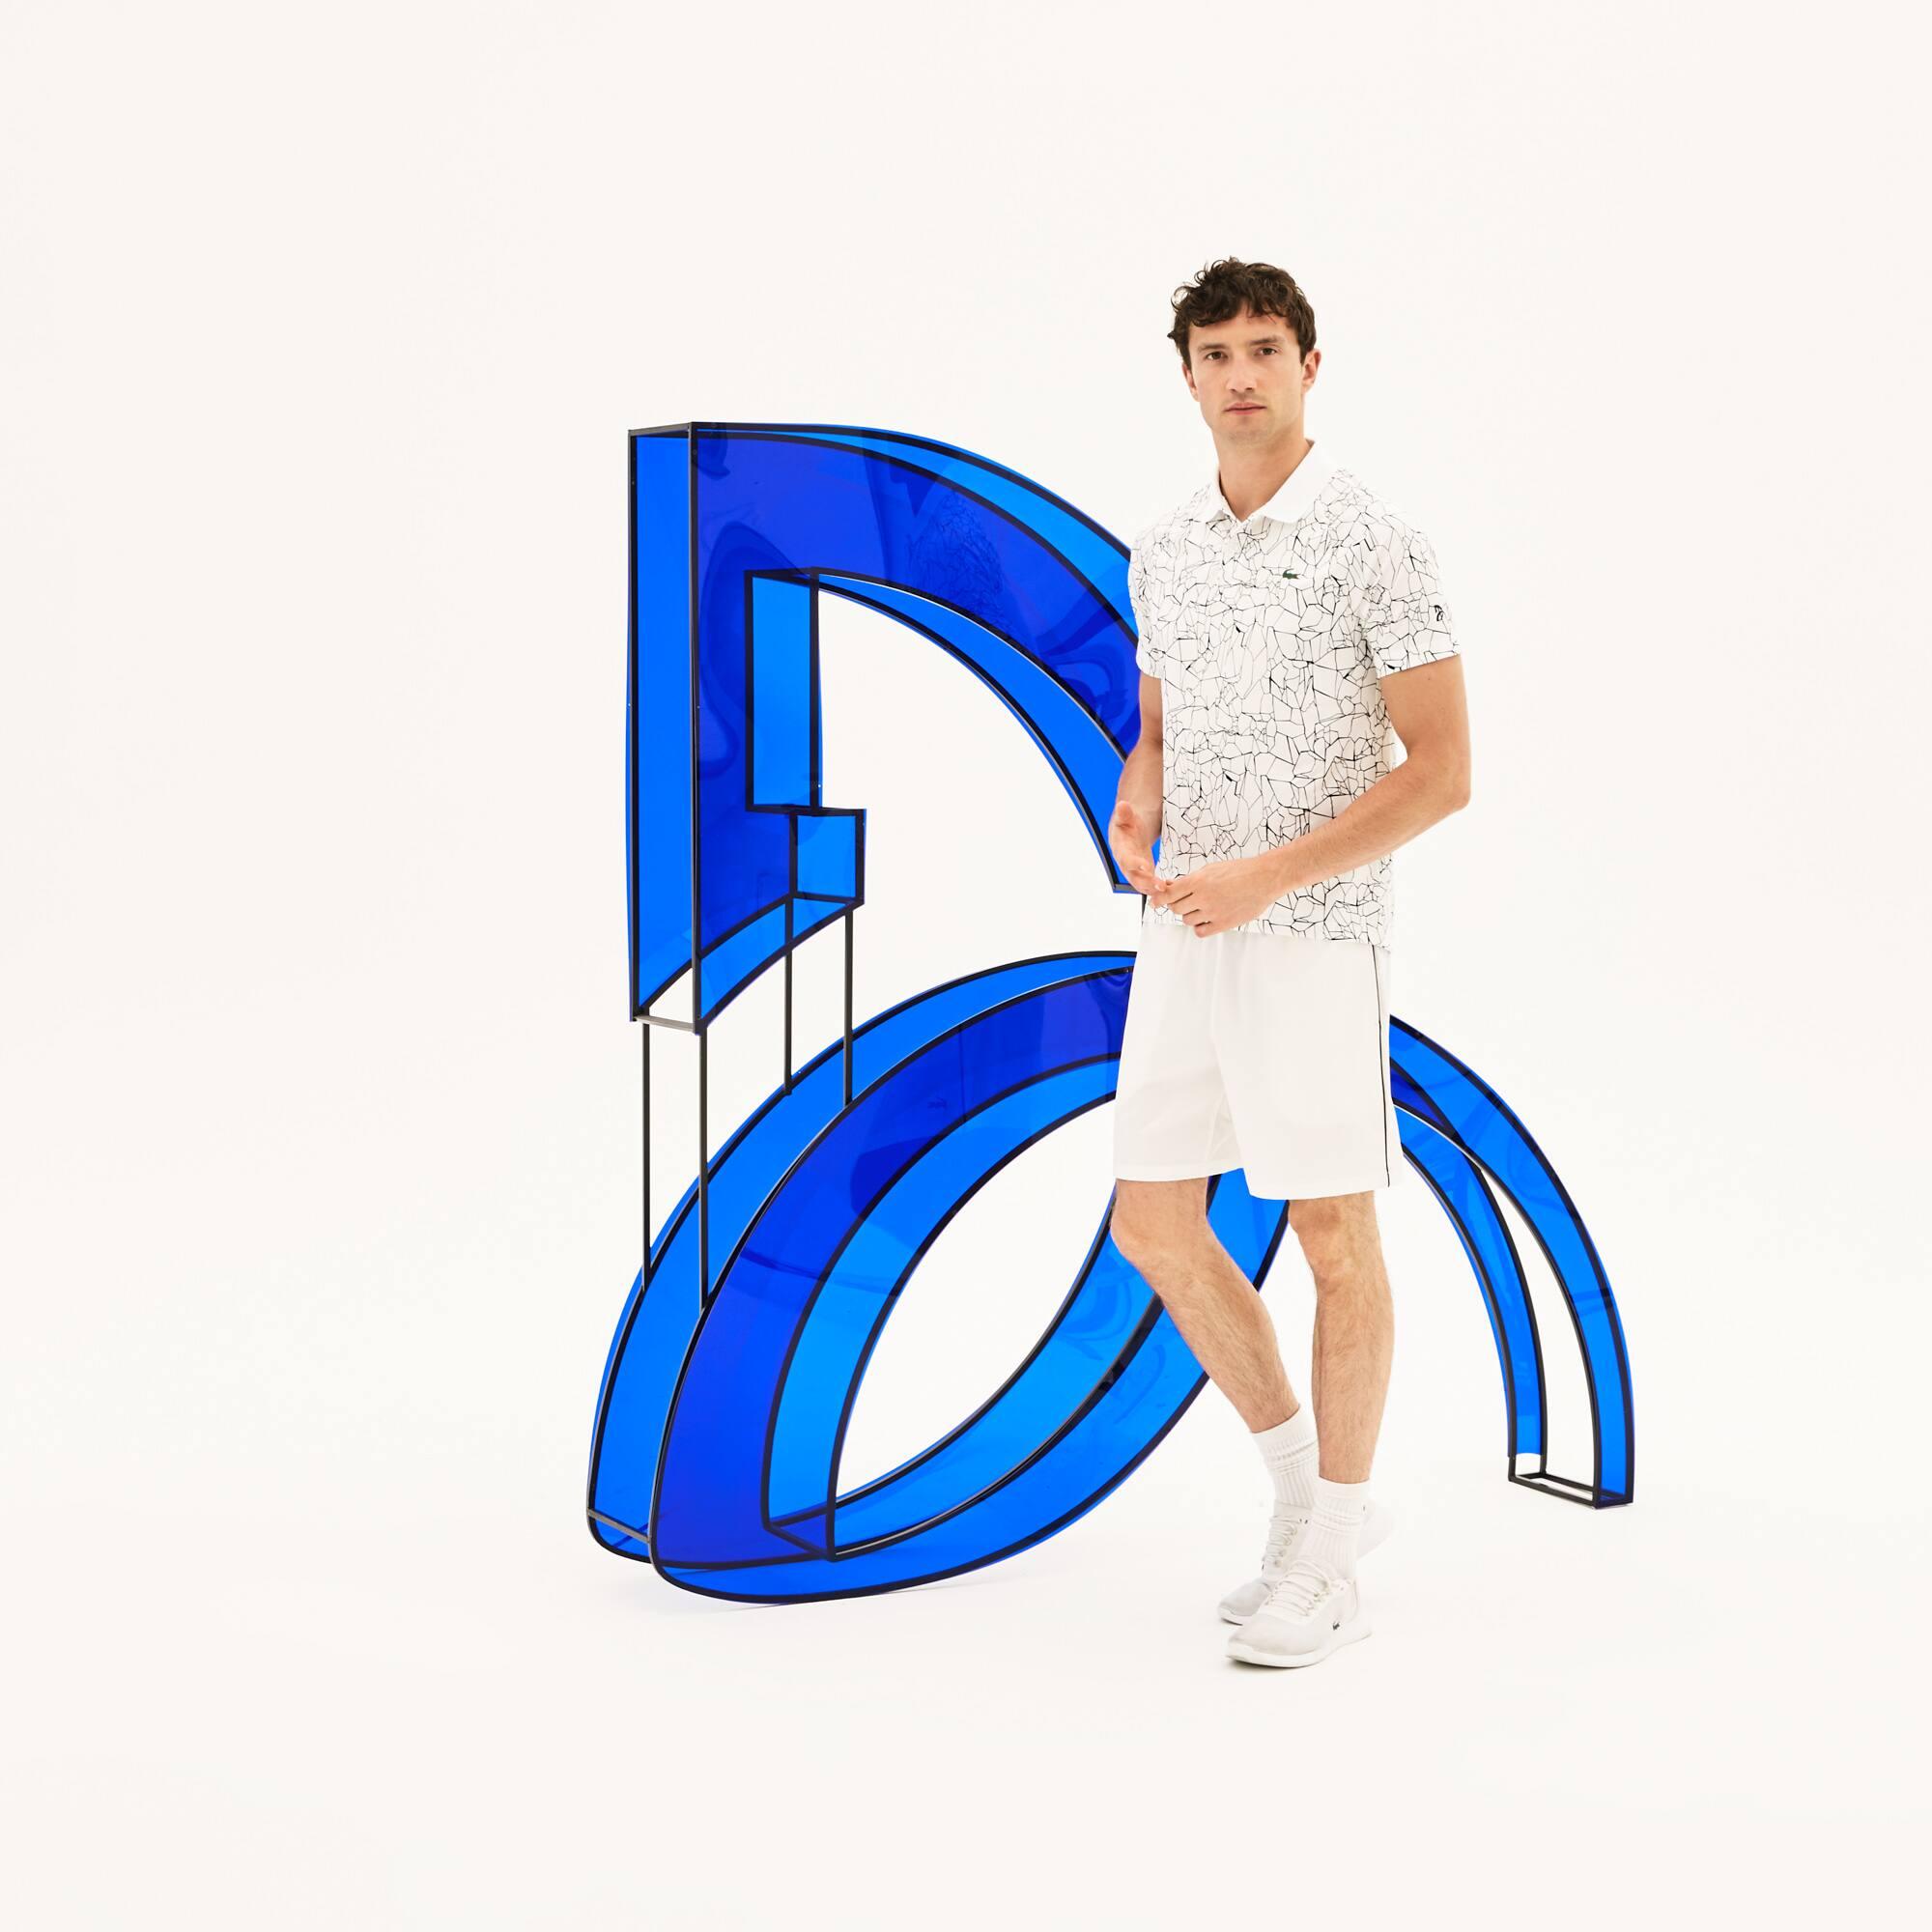 Lacoste - Polo De Hombre Lacoste SPORT Novak Djokovic-On Court Collection En Tejido De Punto Técnico Estampado - 1